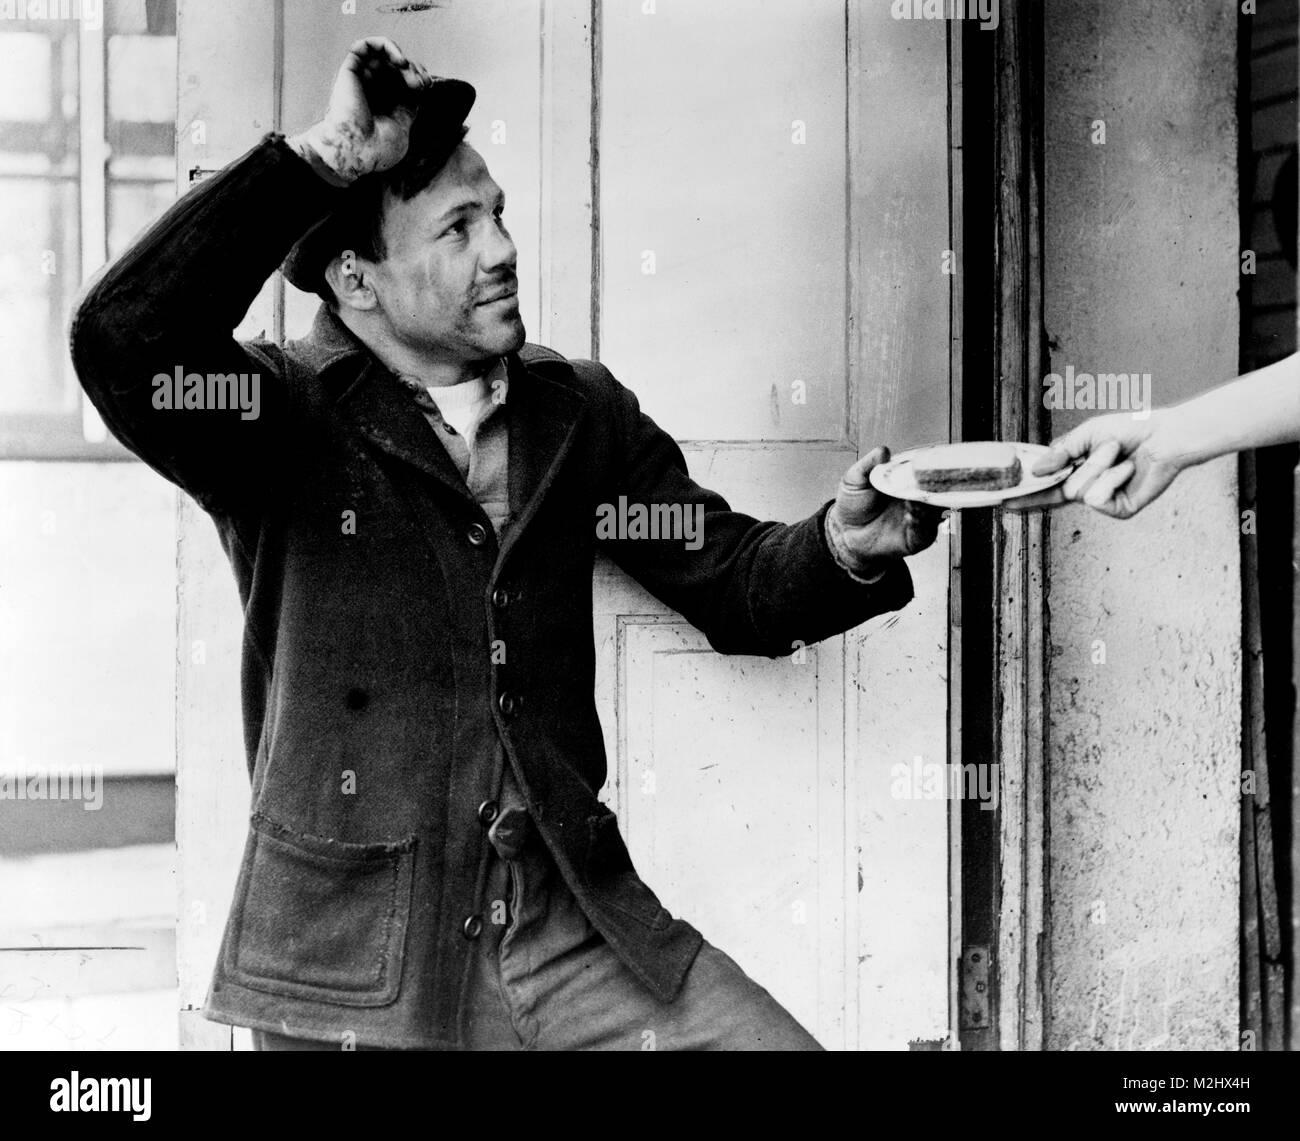 Hobo Accepts Sandwich, 1935 - Stock Image